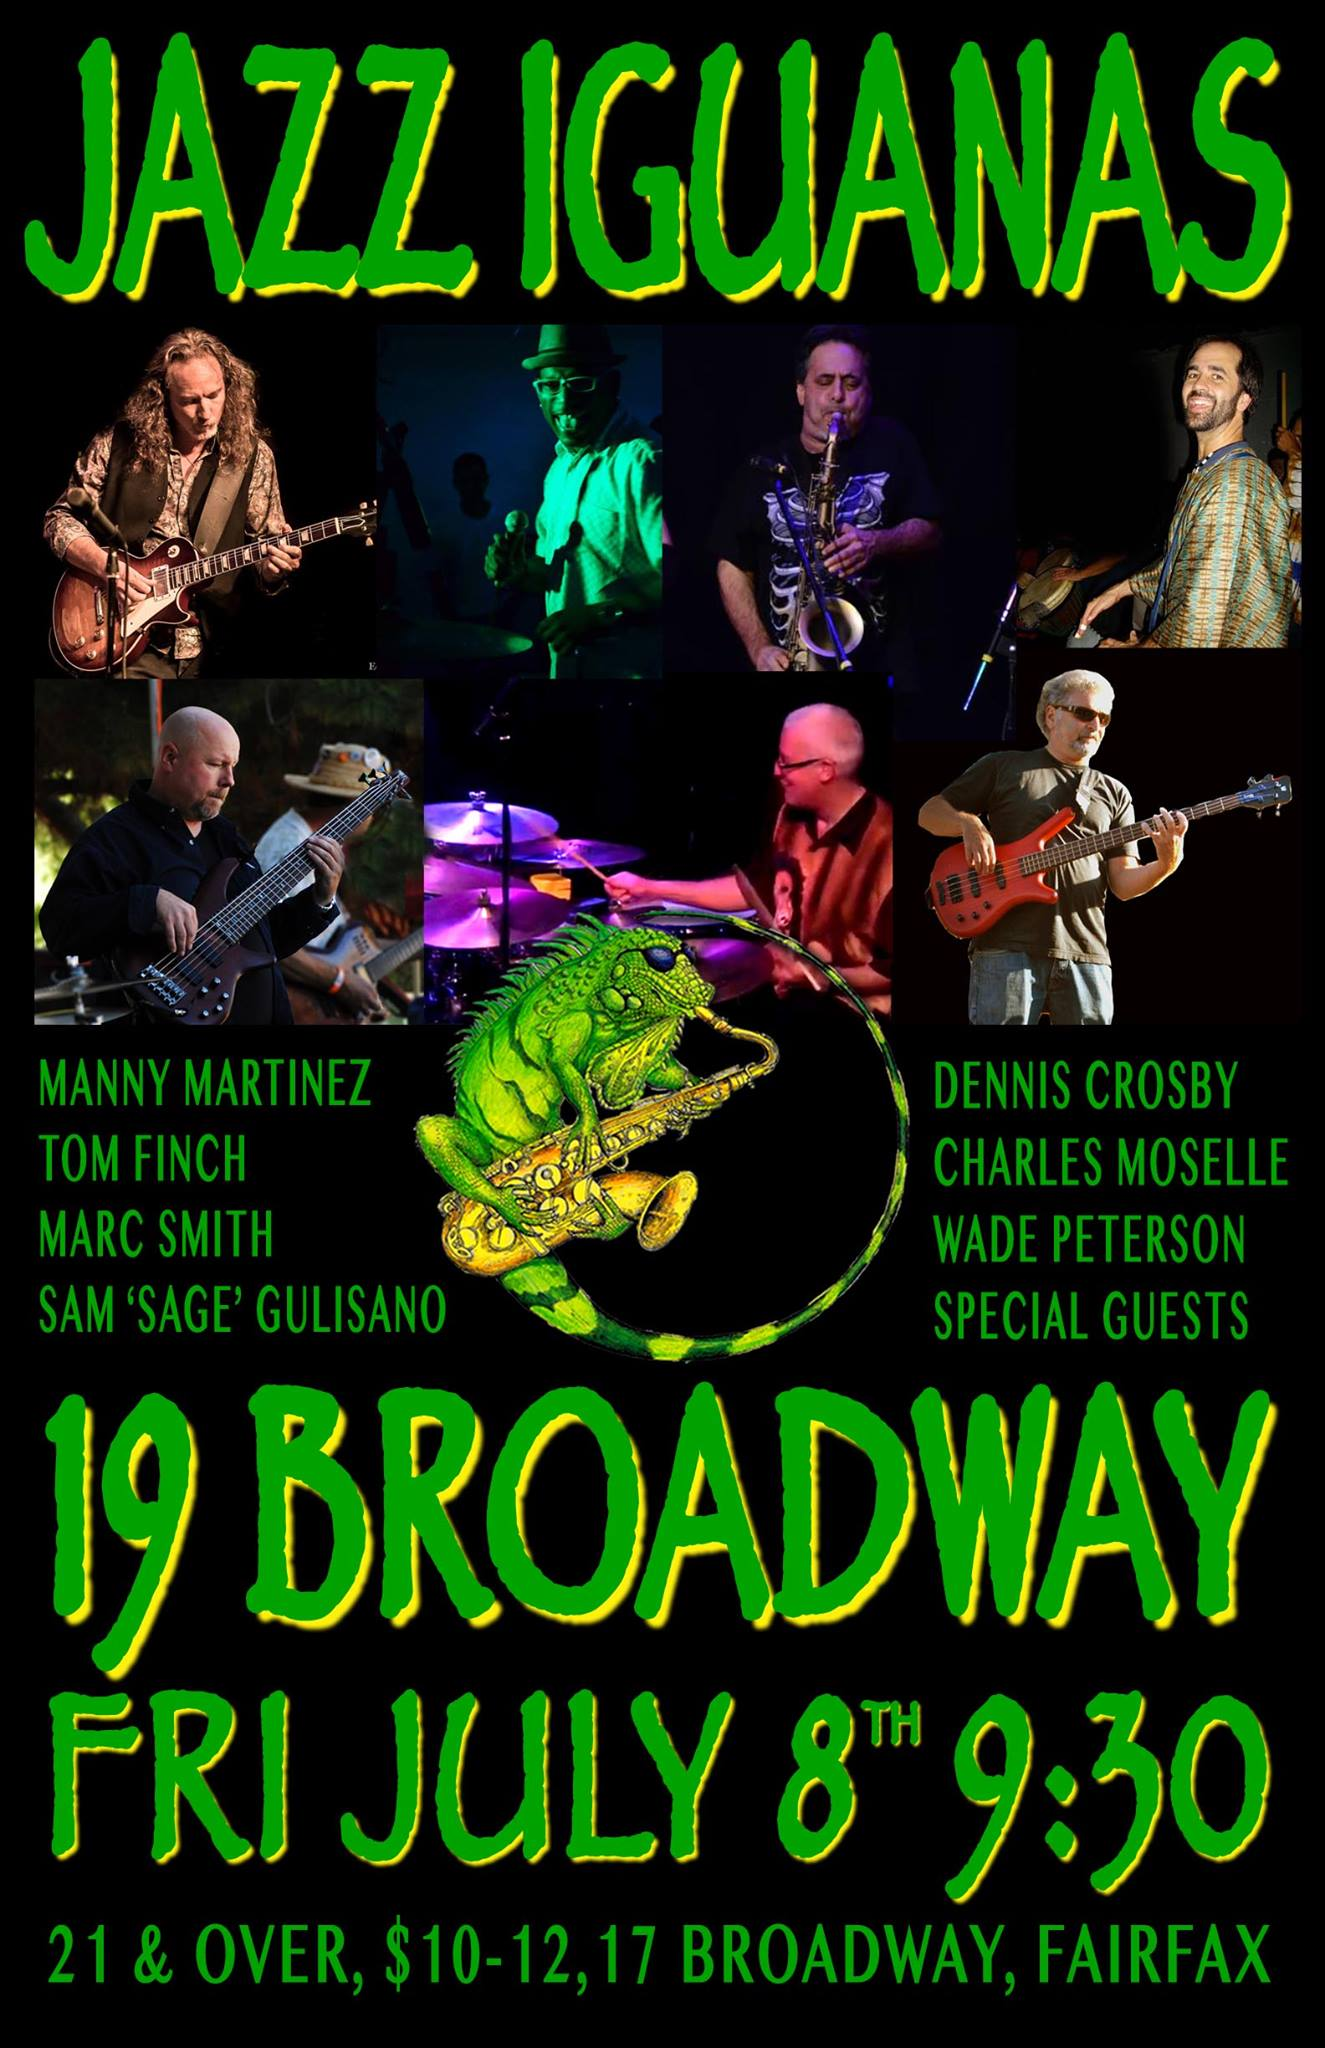 jazz-iguanas-poster-2